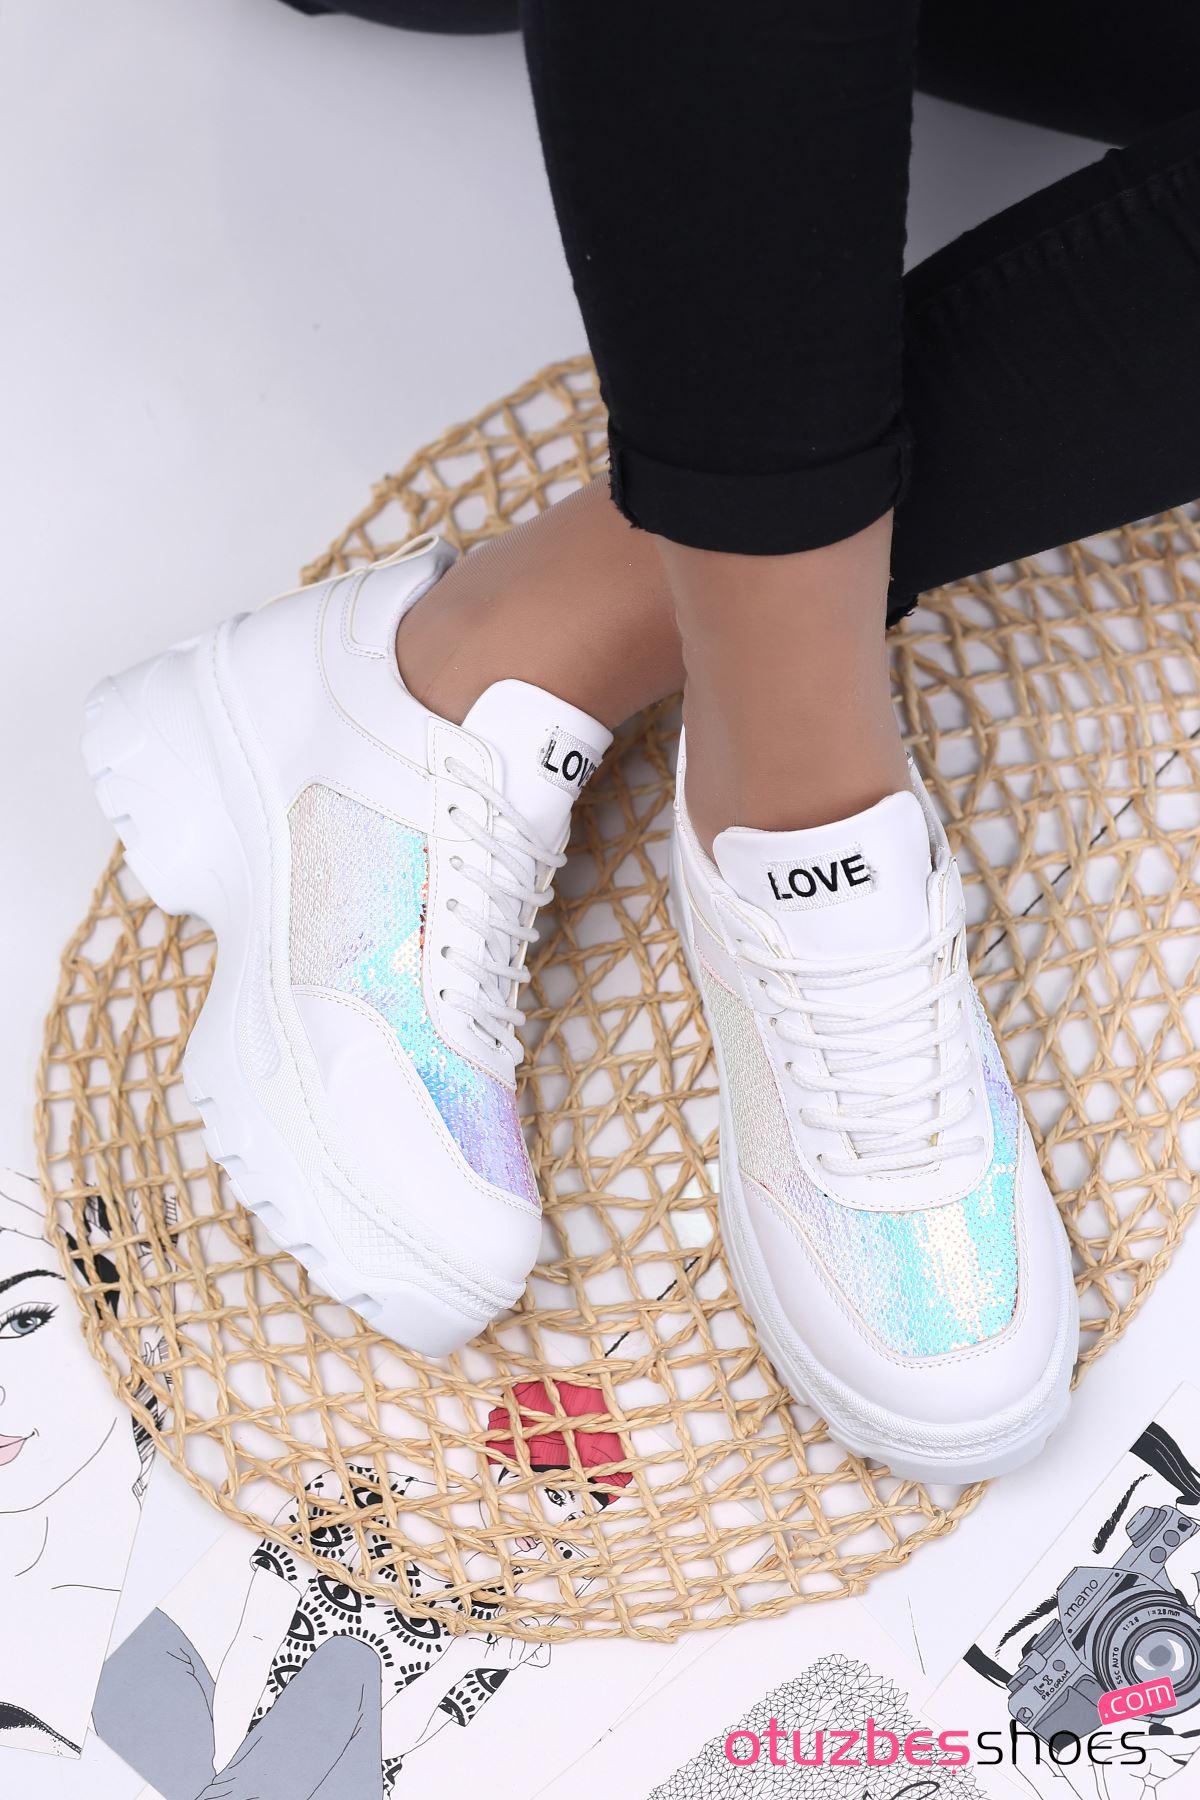 Fiona Mat Deri Pullu Hologram Bayan Spor Ayakkabı Beyaz